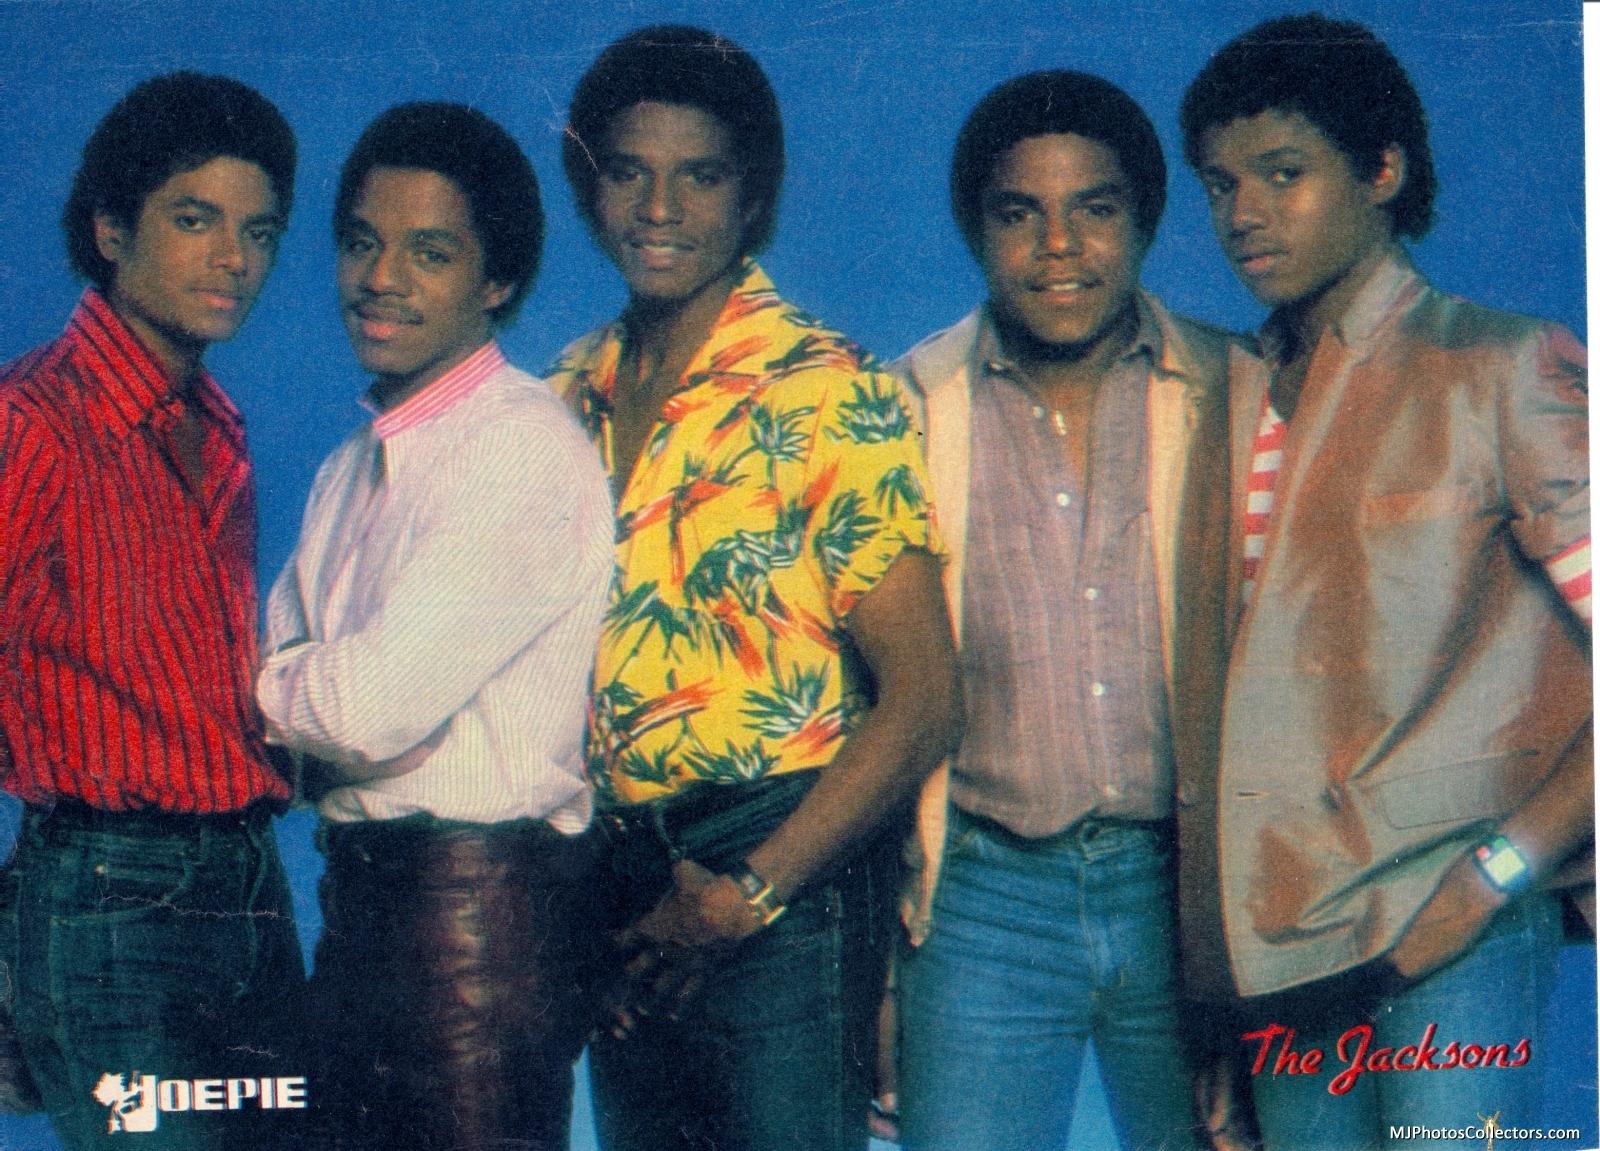 The Jacksons The-jacksons-the-jackson-5-17014972-1600-1151